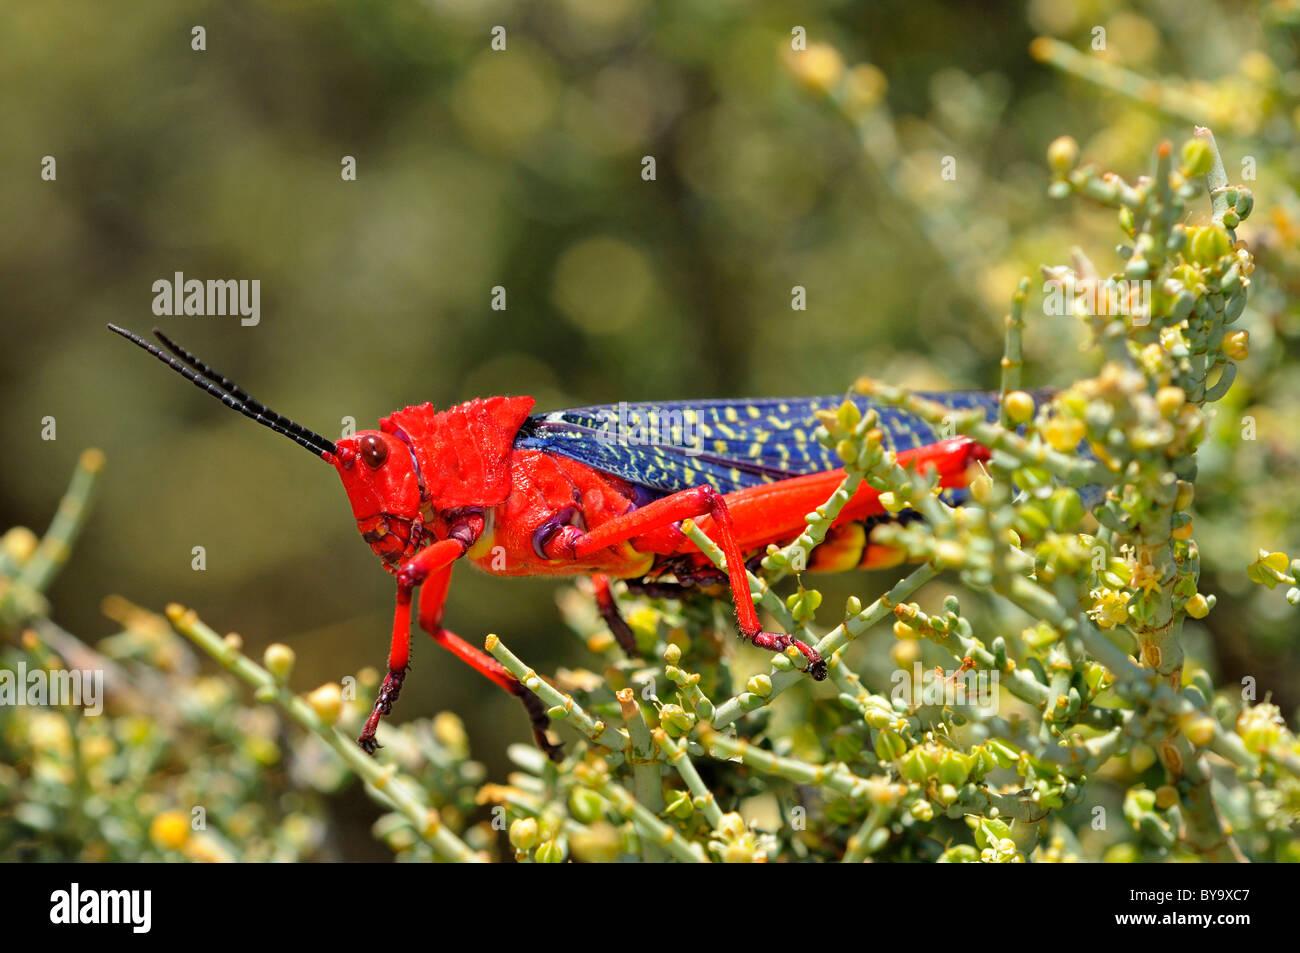 Common milkweed locust, Goegap Nature Reserve, Namaqualand, South Africa - Stock Image